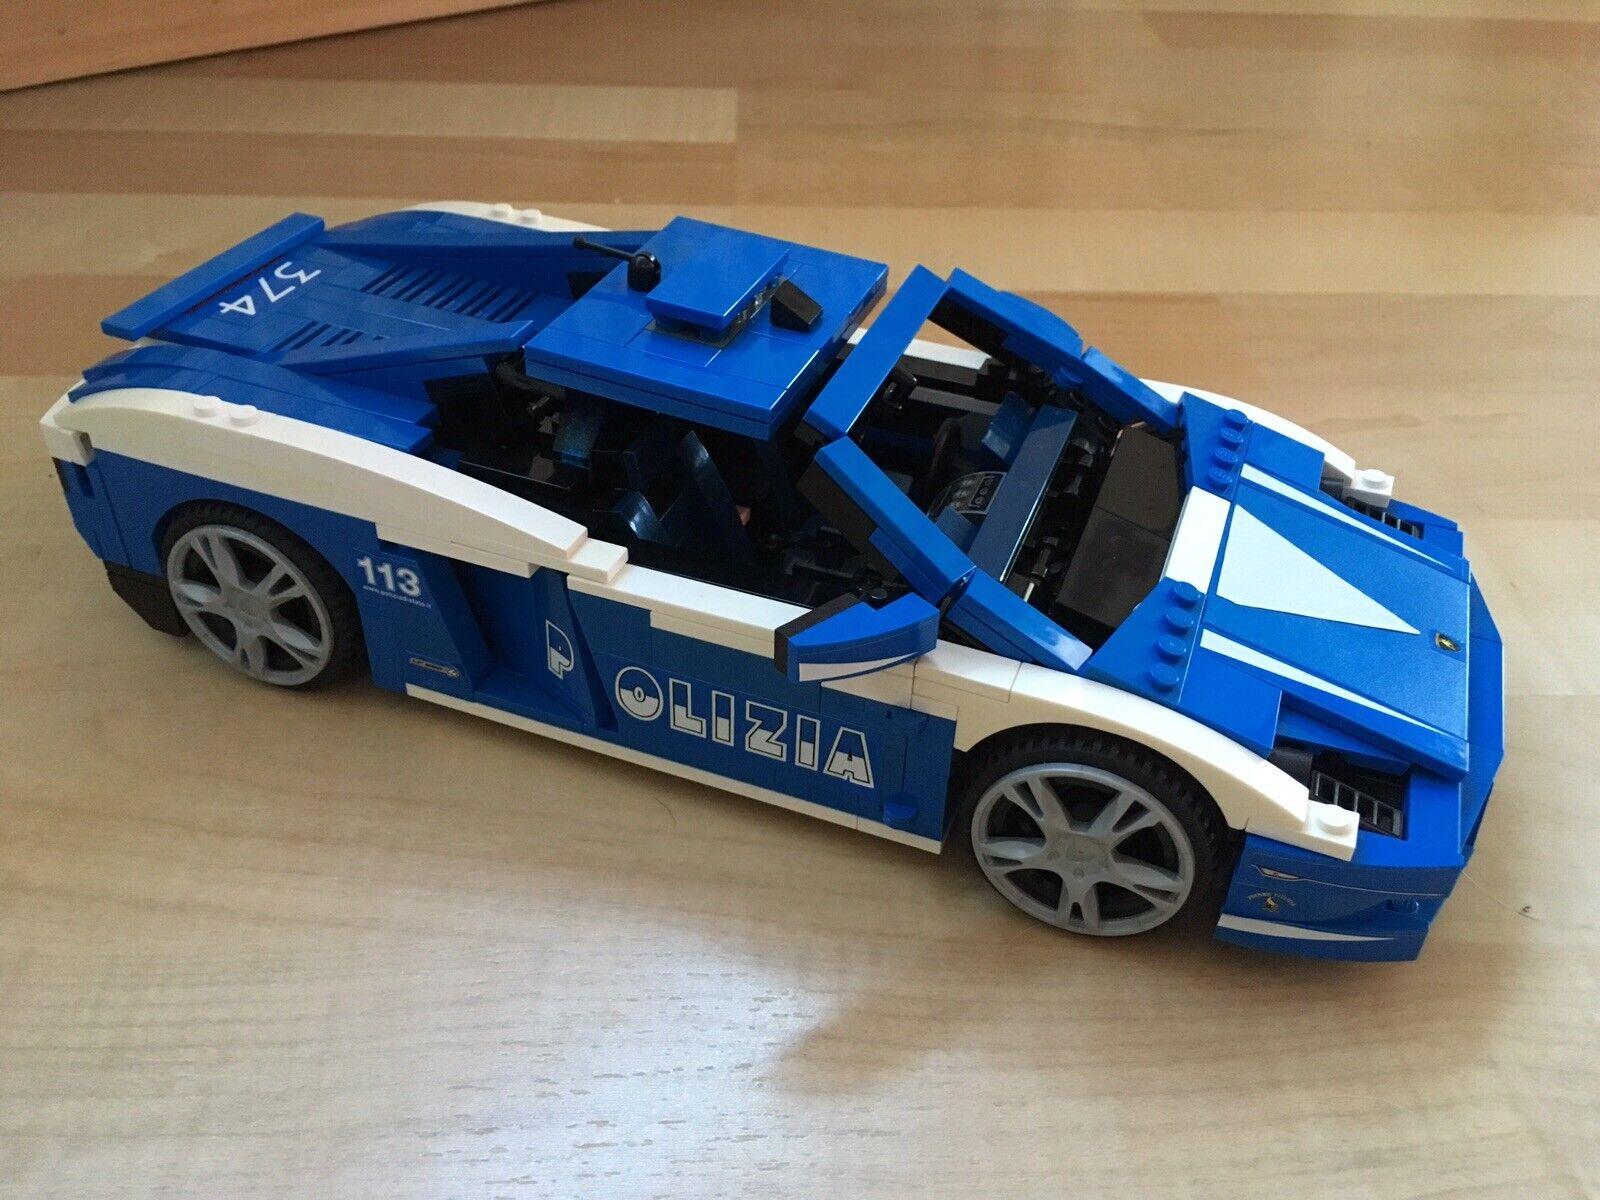 Lego Technic Technik Racer 8214 Lamborghini .